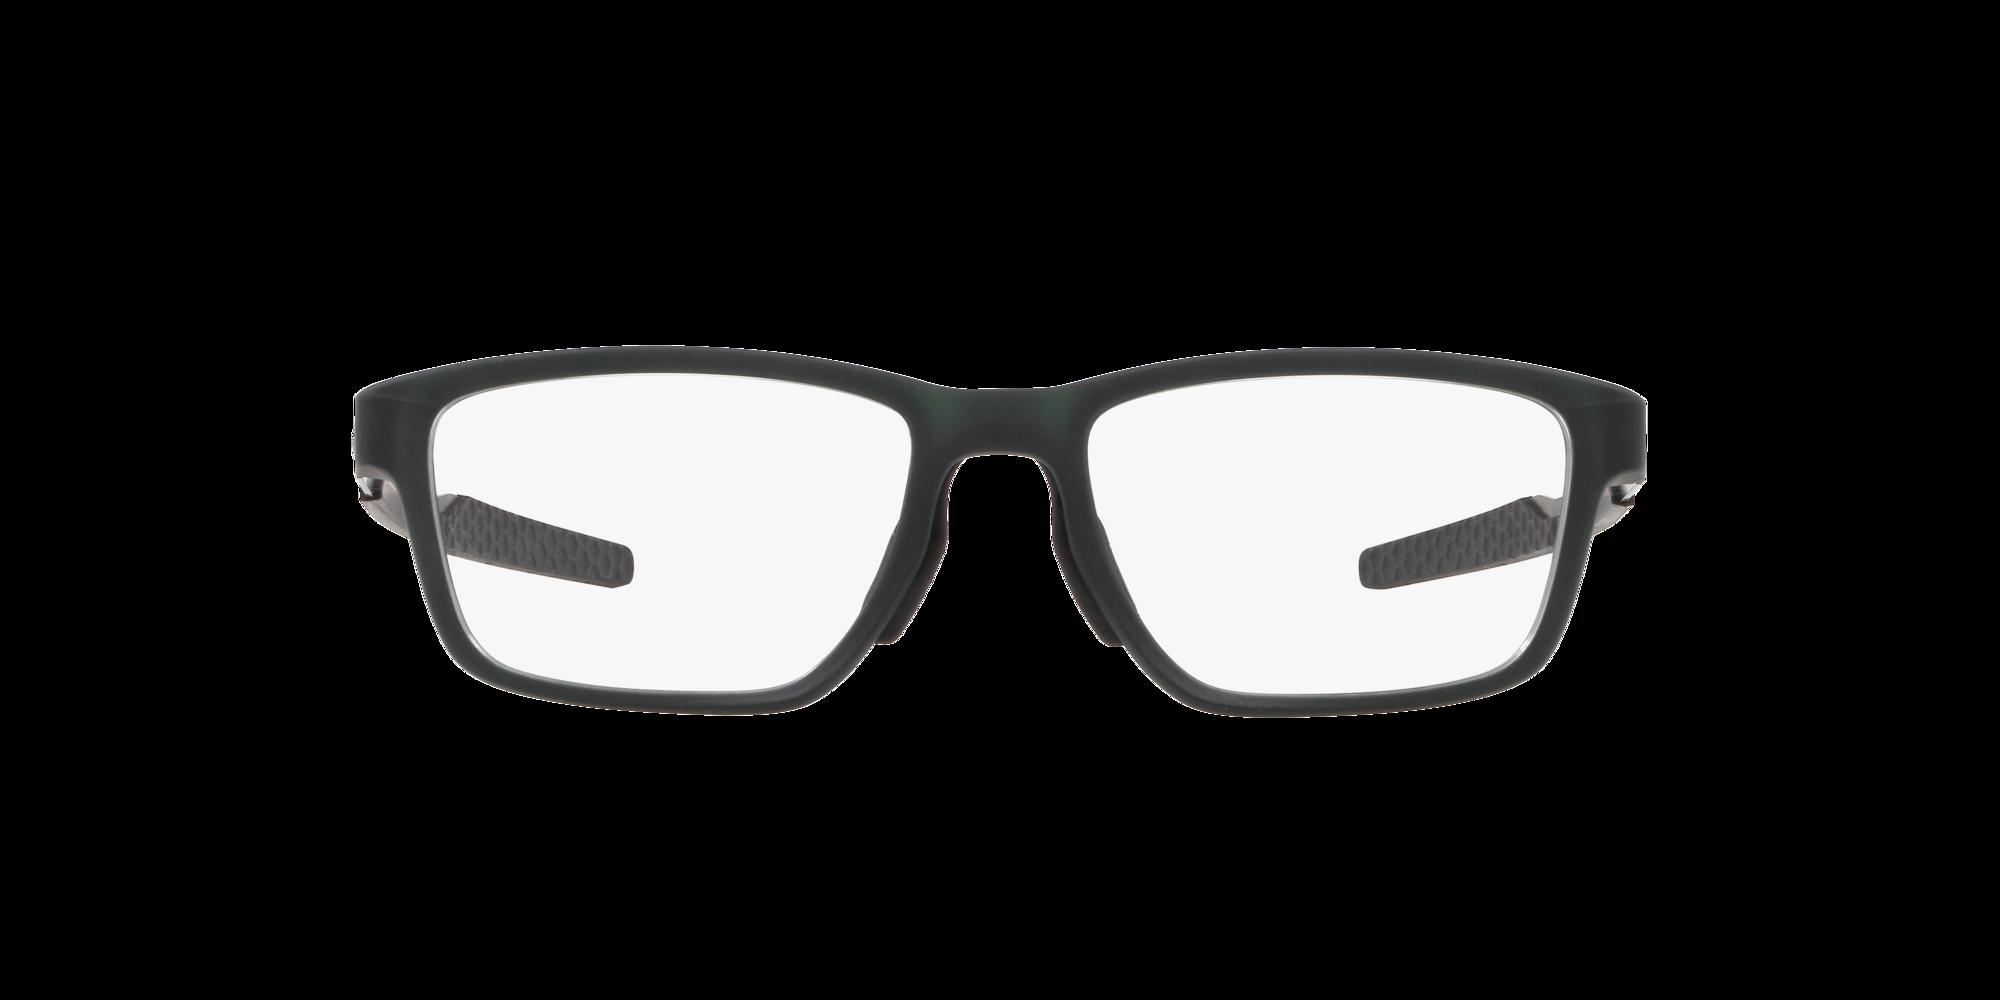 Image for OX8153 Metalink from LensCrafters | Glasses, Prescription Glasses Online, Eyewear